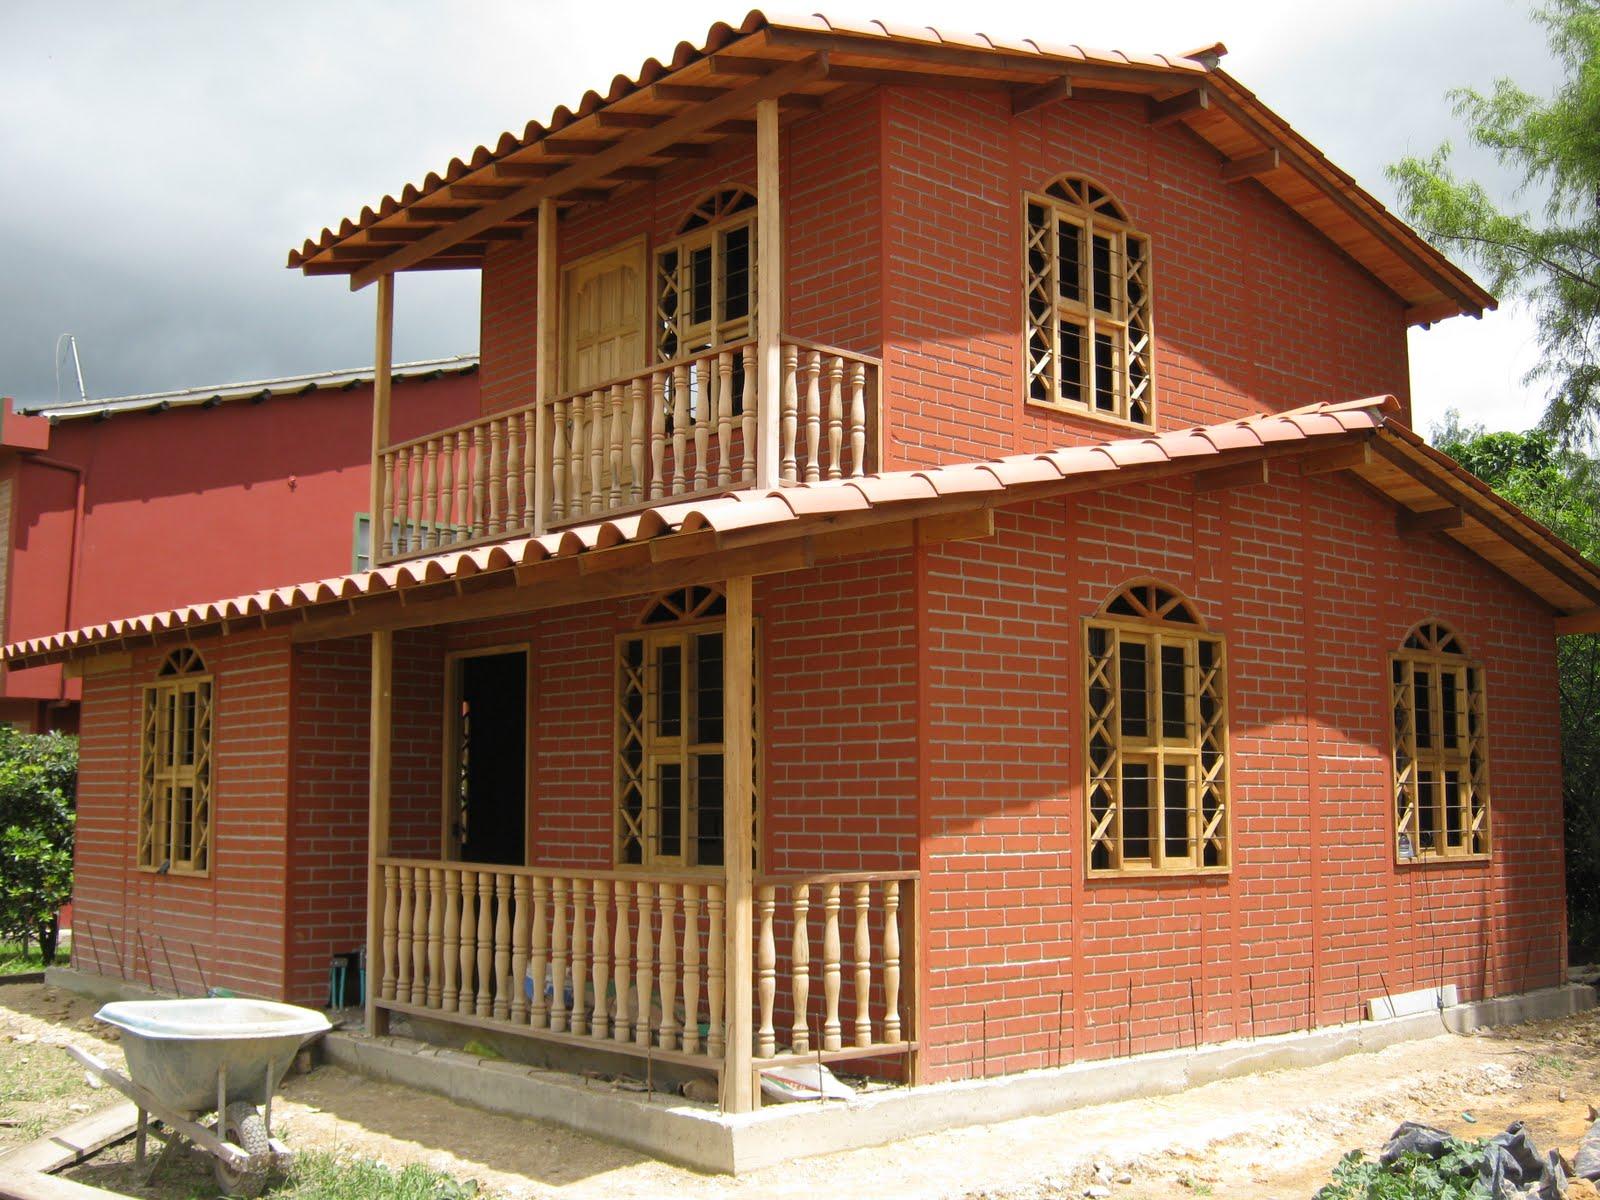 Casas prefabricadas creando viviendas sas septiembre 2010 - Casas baratas prefabricadas ...